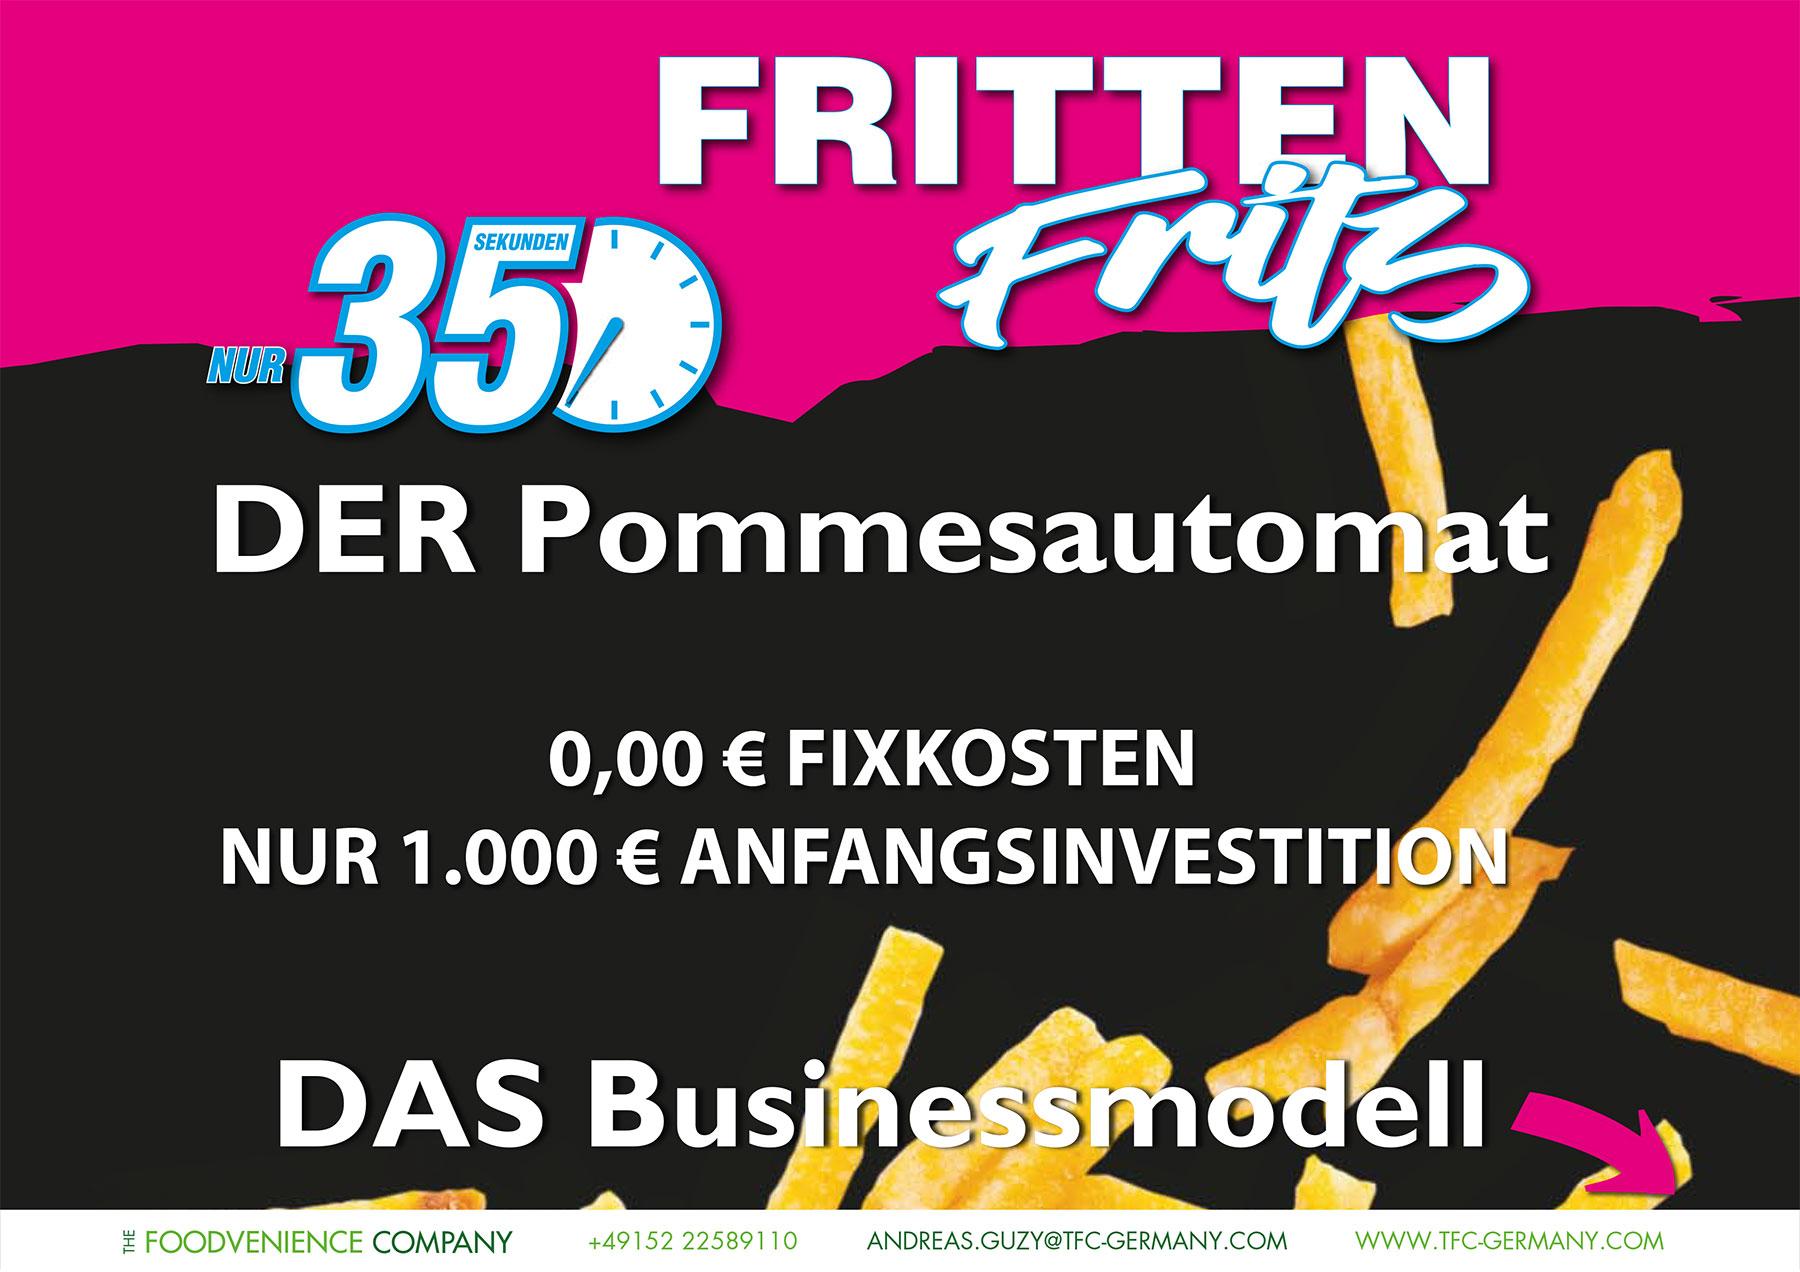 The Foodvenience Company - Dessau-Roßlau - Sachsen-Anhalt - Fritten Fritz - Frittenautomat